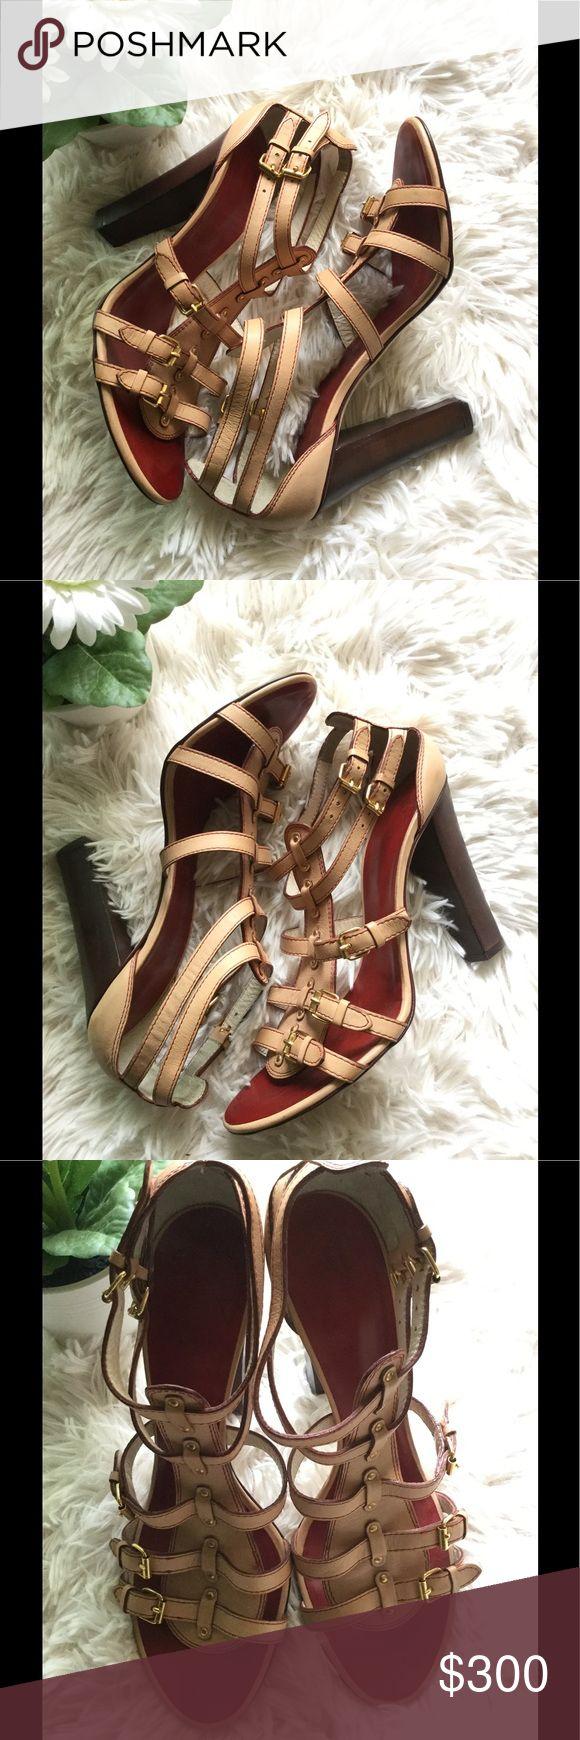 🌹Giuseppe Zanotti rose gold -brown Heels 🌹 🌹Giuseppe Zanotti rose gold - brown Heels in pristine condition 🌹 Giuseppe Zanotti Shoes Heels